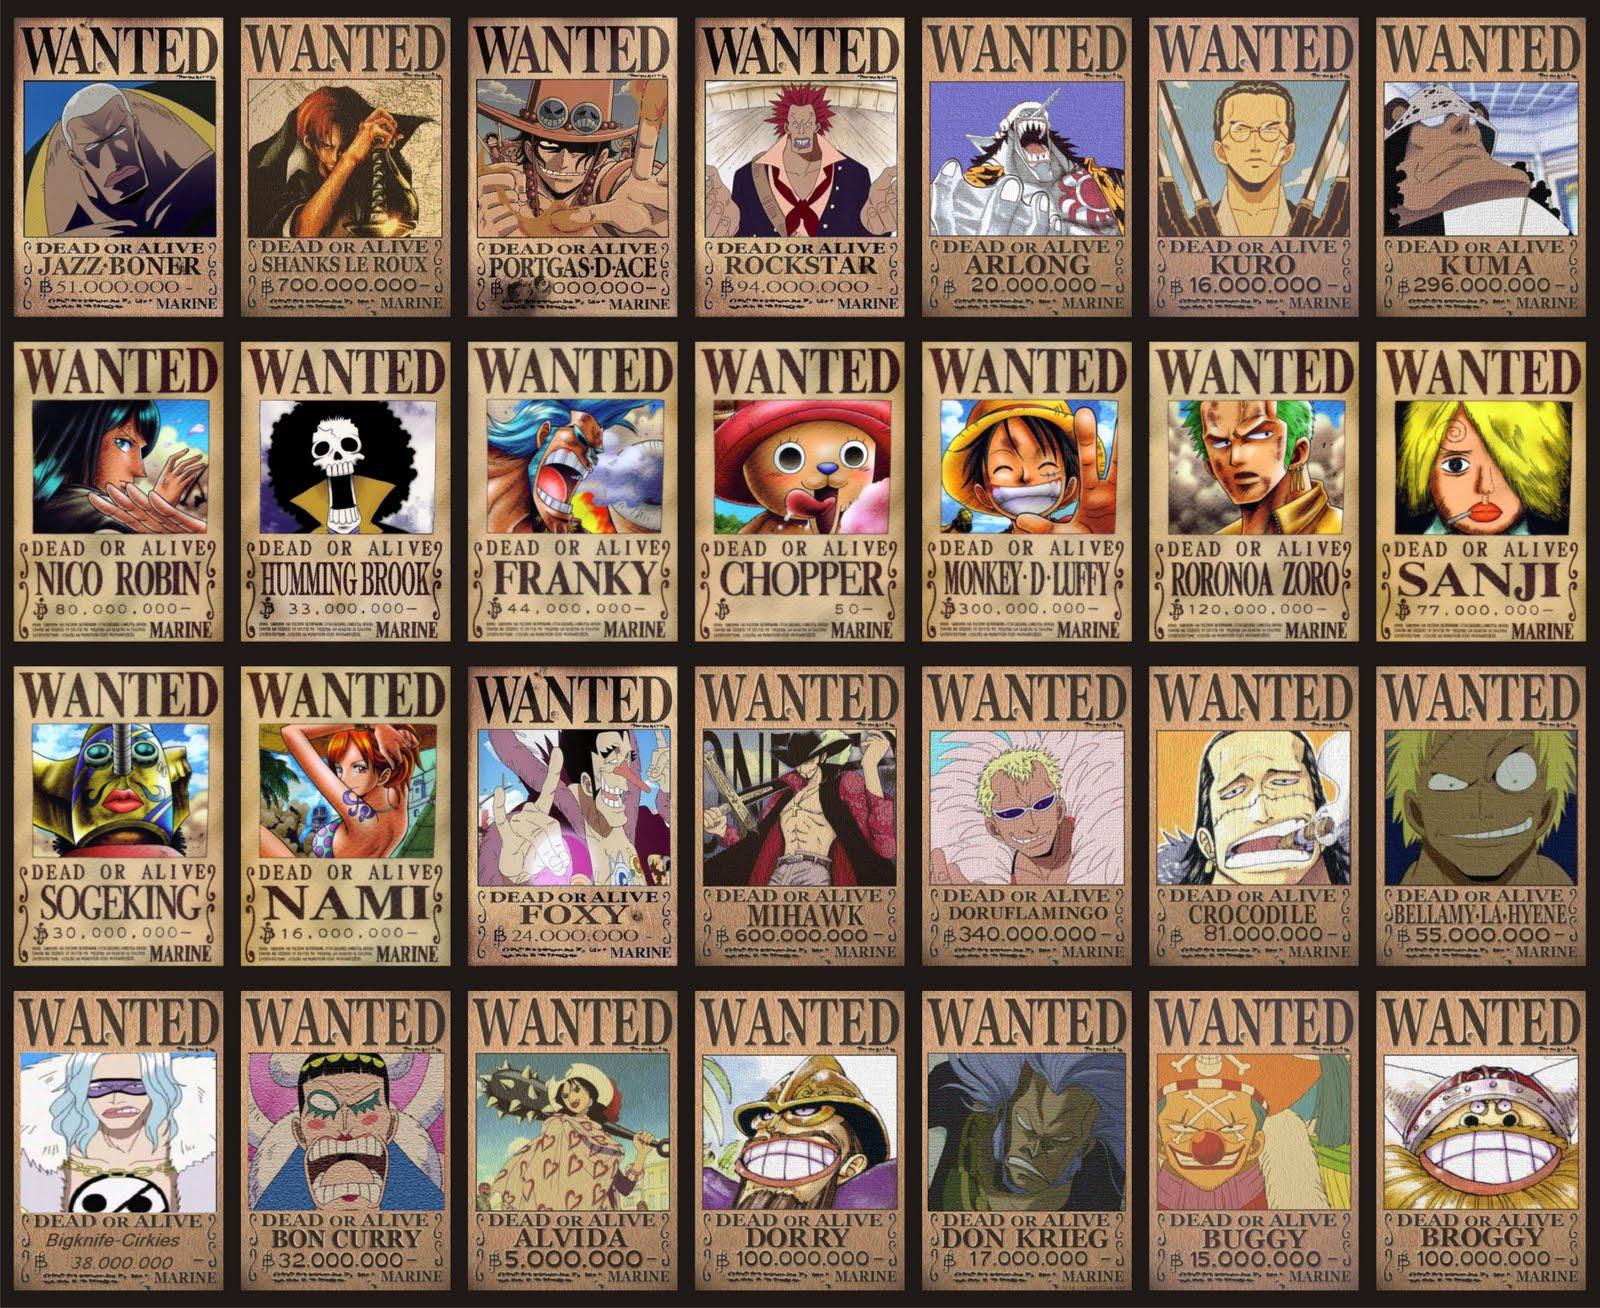 http://1.bp.blogspot.com/--bejMxHDMSY/TinWE66ekQI/AAAAAAAADI4/RFy6yY_fzyc/s1600/one_piece_wanted_posters_wallp_by_difenderu-2364567066.jpg